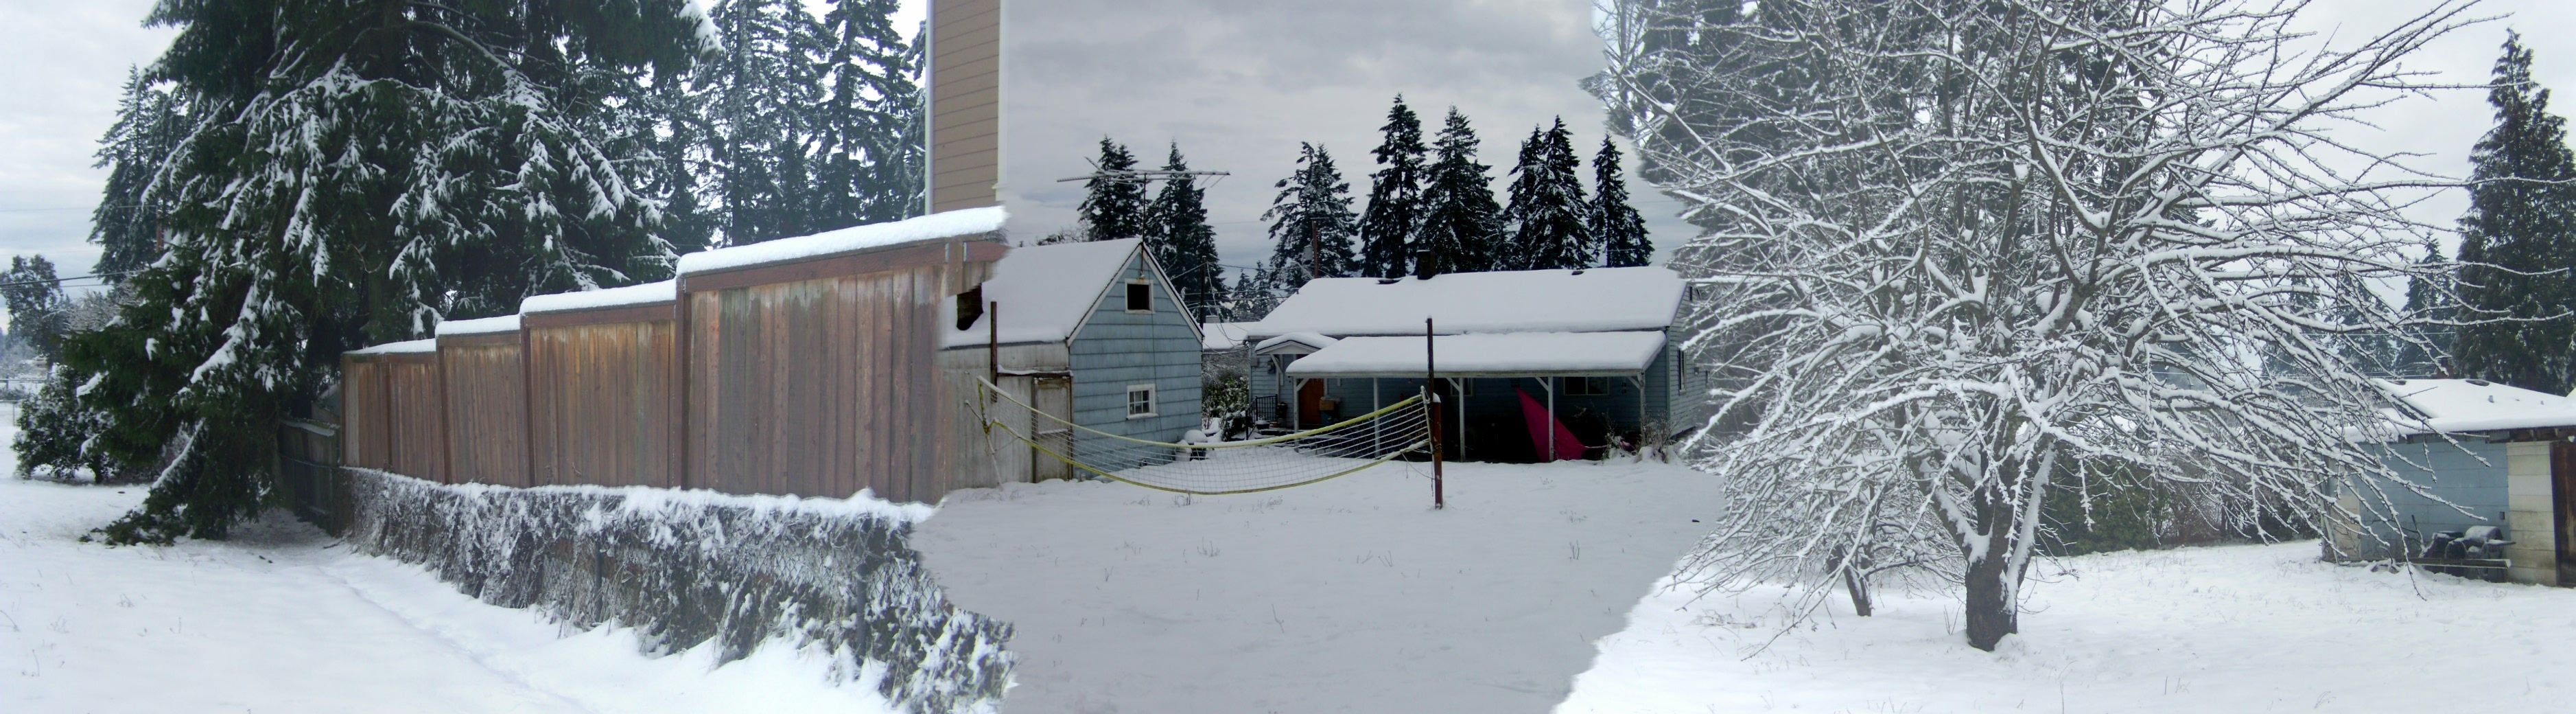 Winter storm 2012, Seattle Area